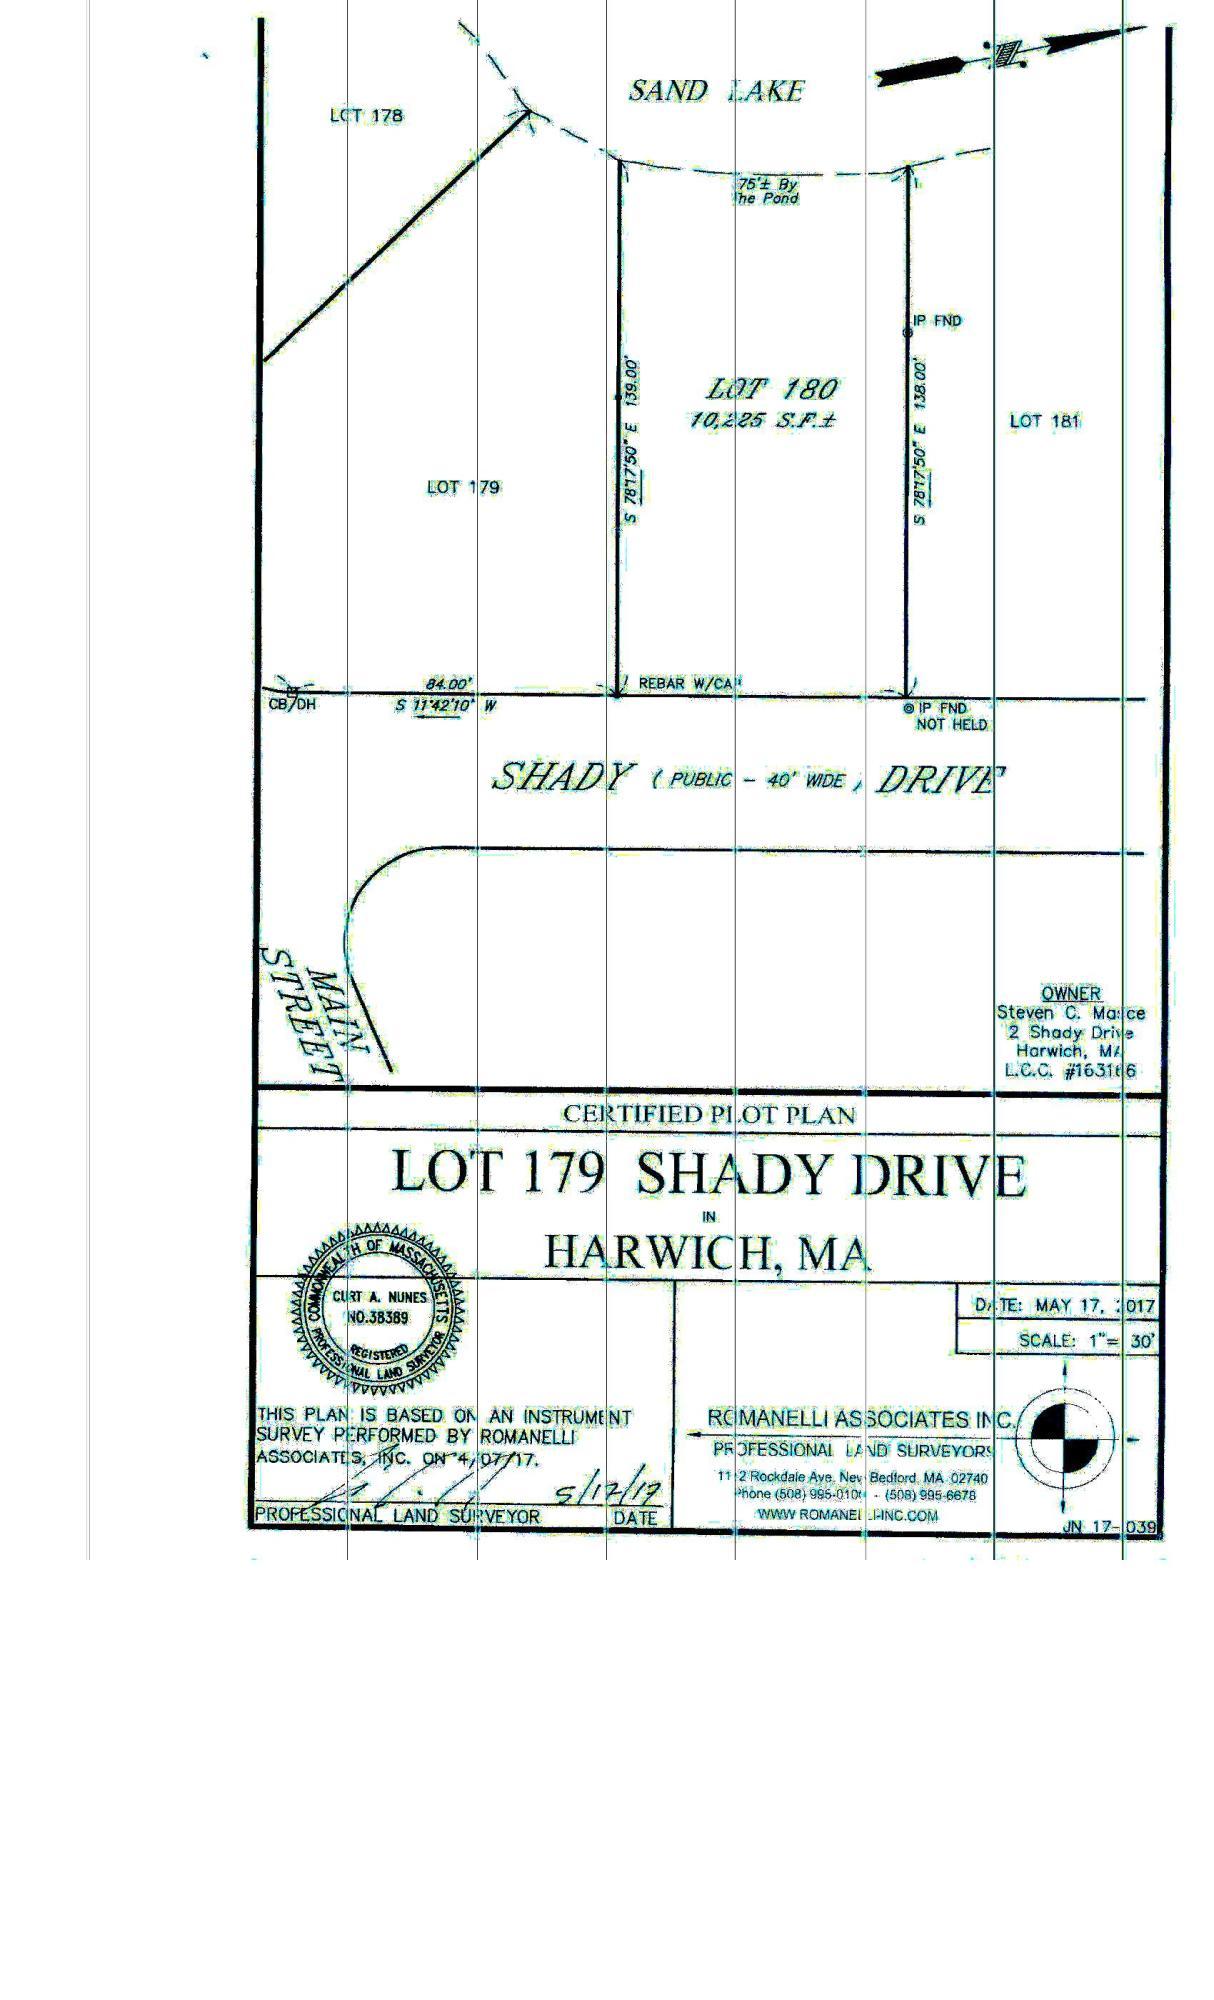 4 shady drive harwich ma 02645 property image 9